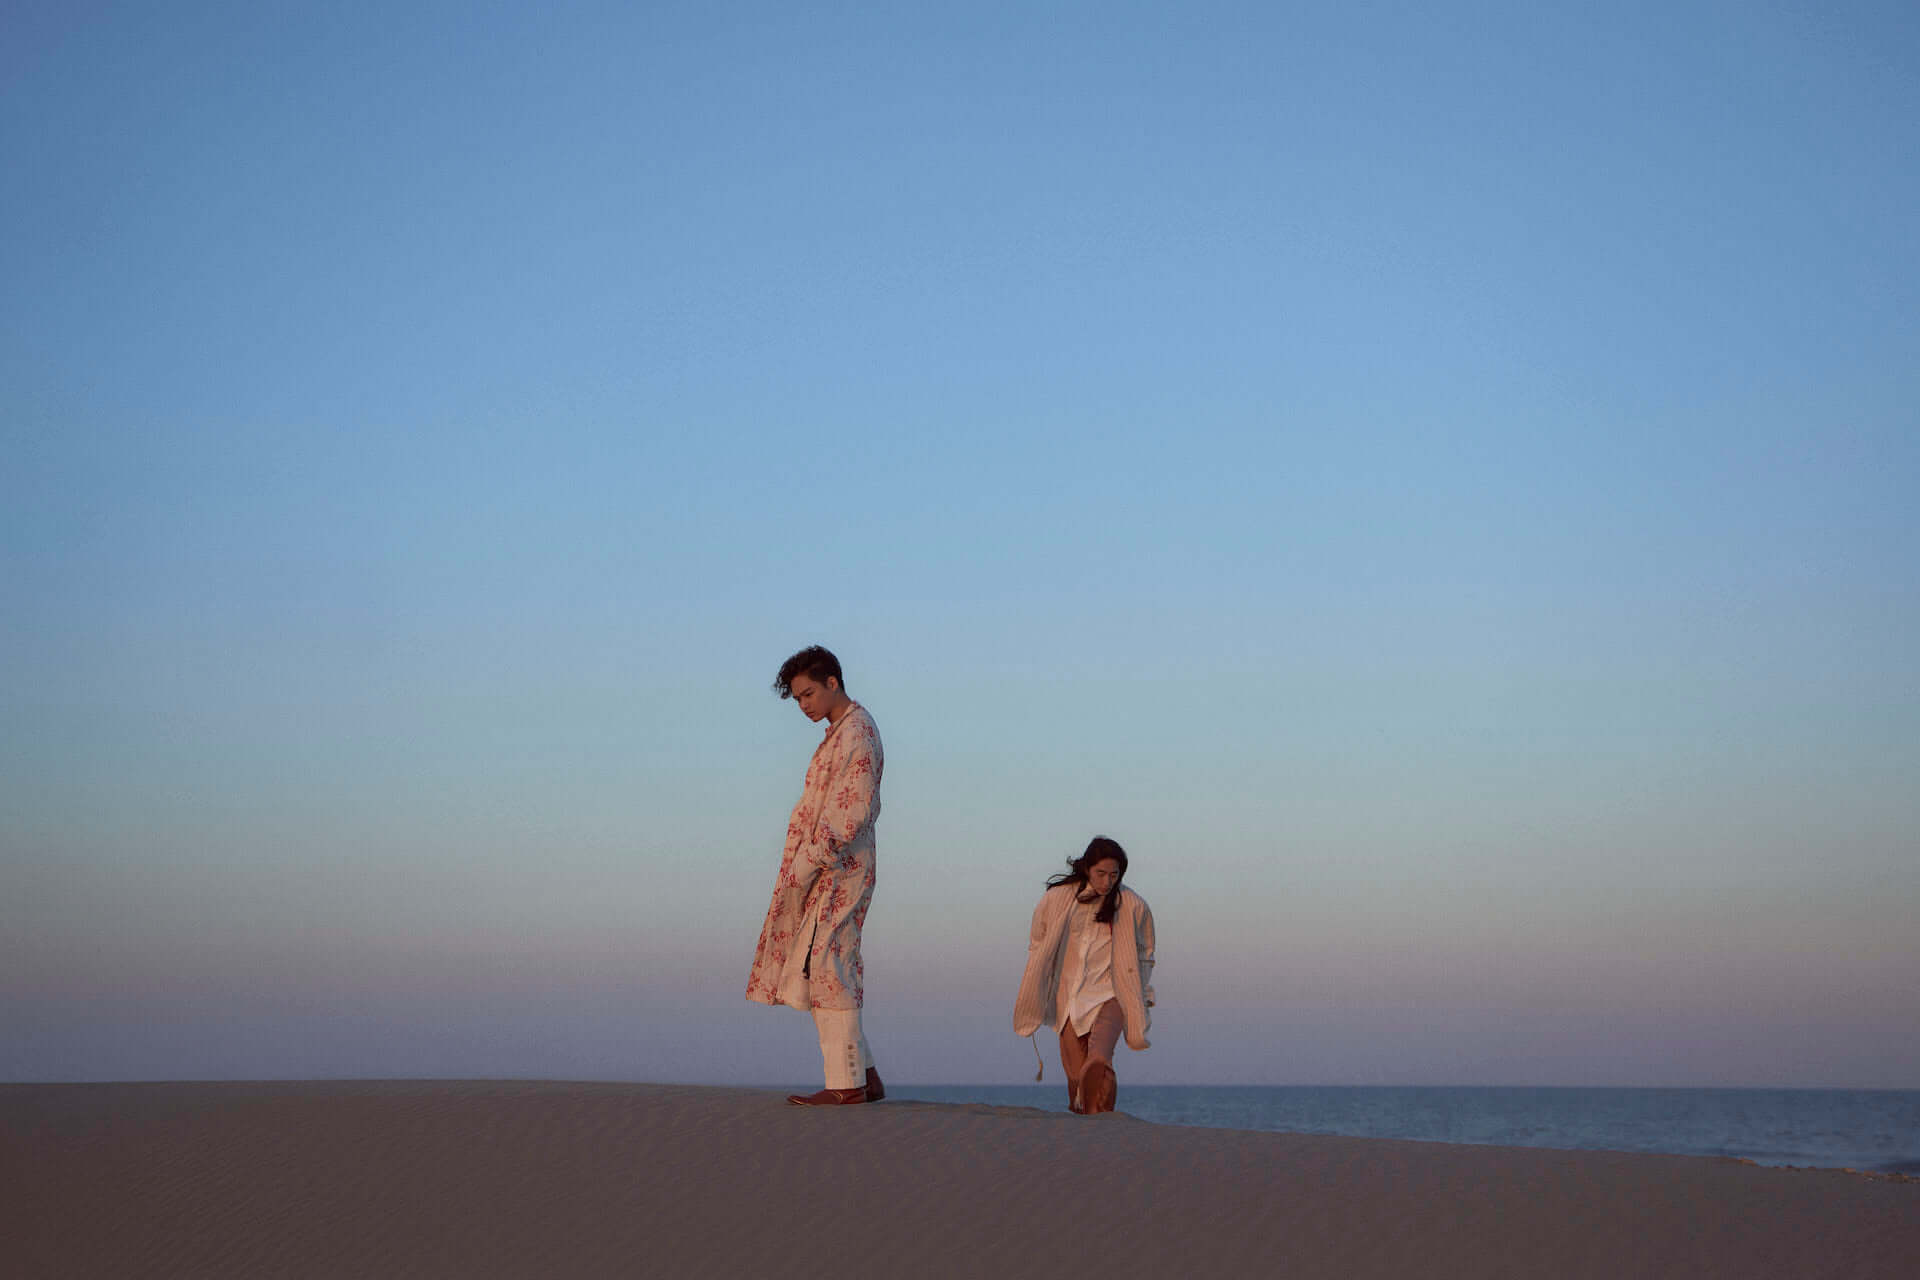 The fin. 9月13日新EP『Wash Away』リリース決定|収録曲「Gravity」先行配信&MVが本日公開 music190816thefin_1-1920x1280